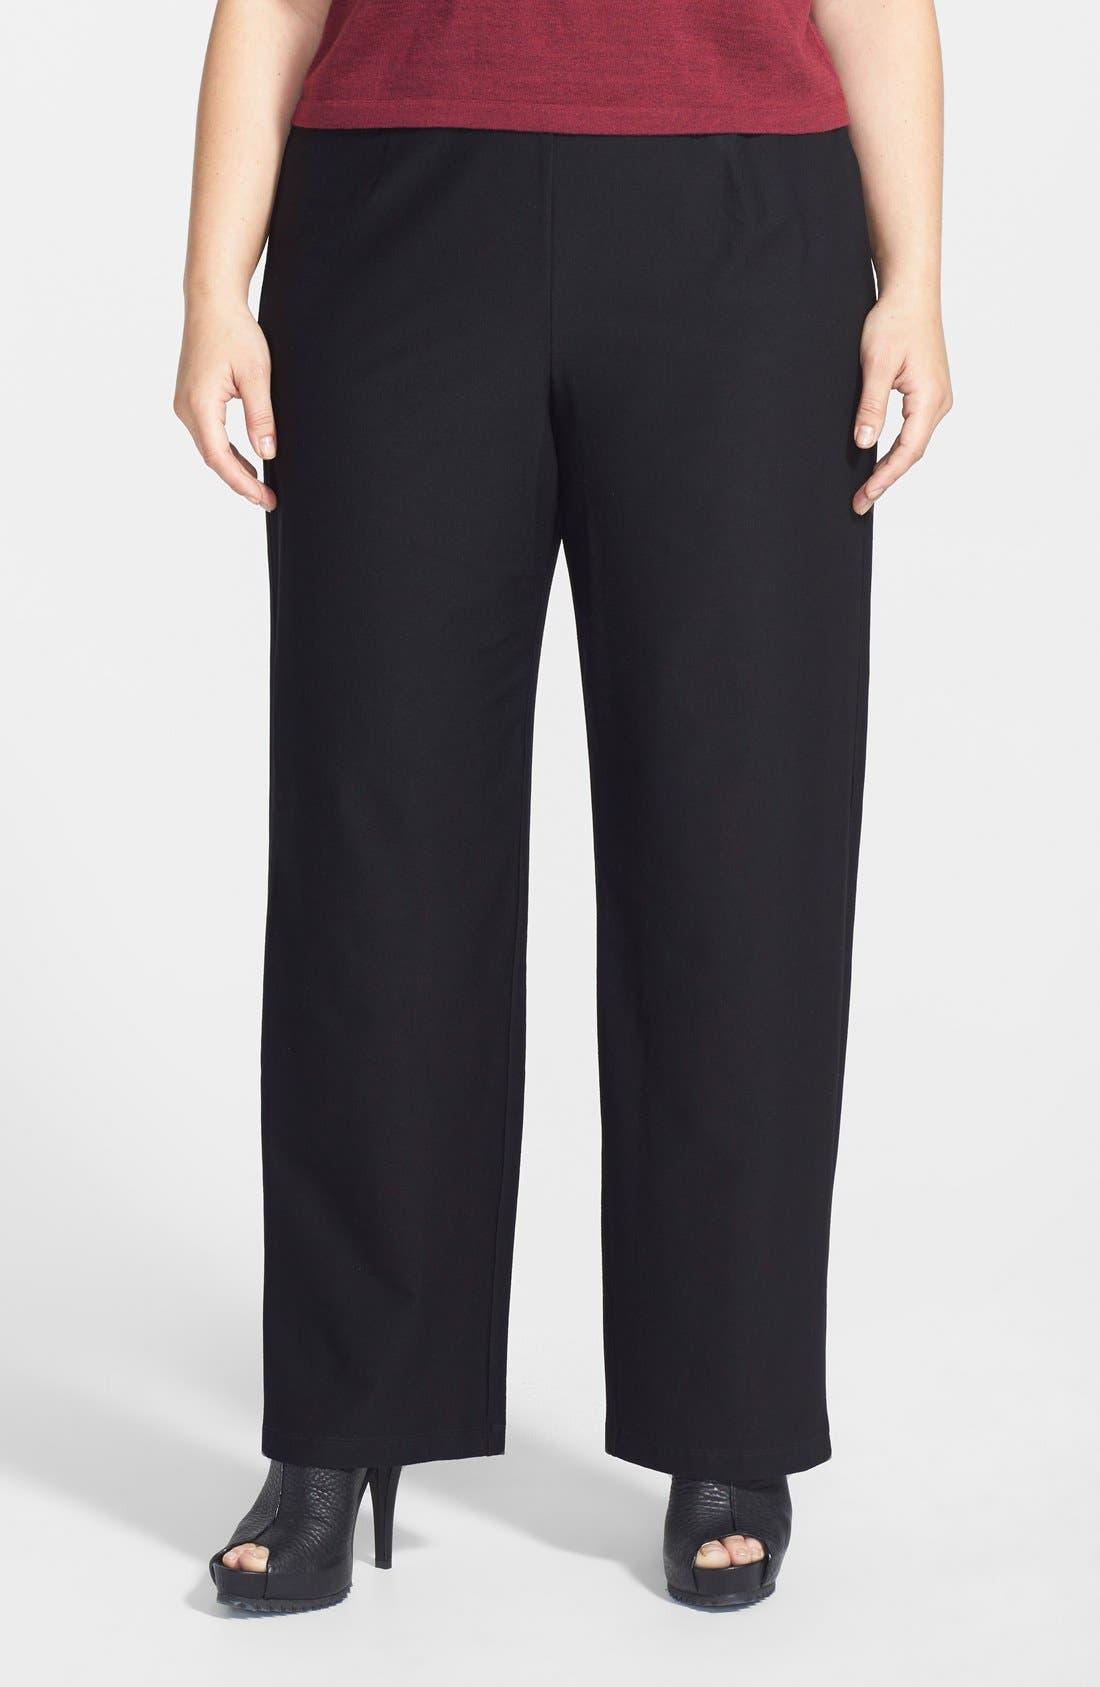 Eileen Fisher Straight Leg Crepe Pants (Plus Size)